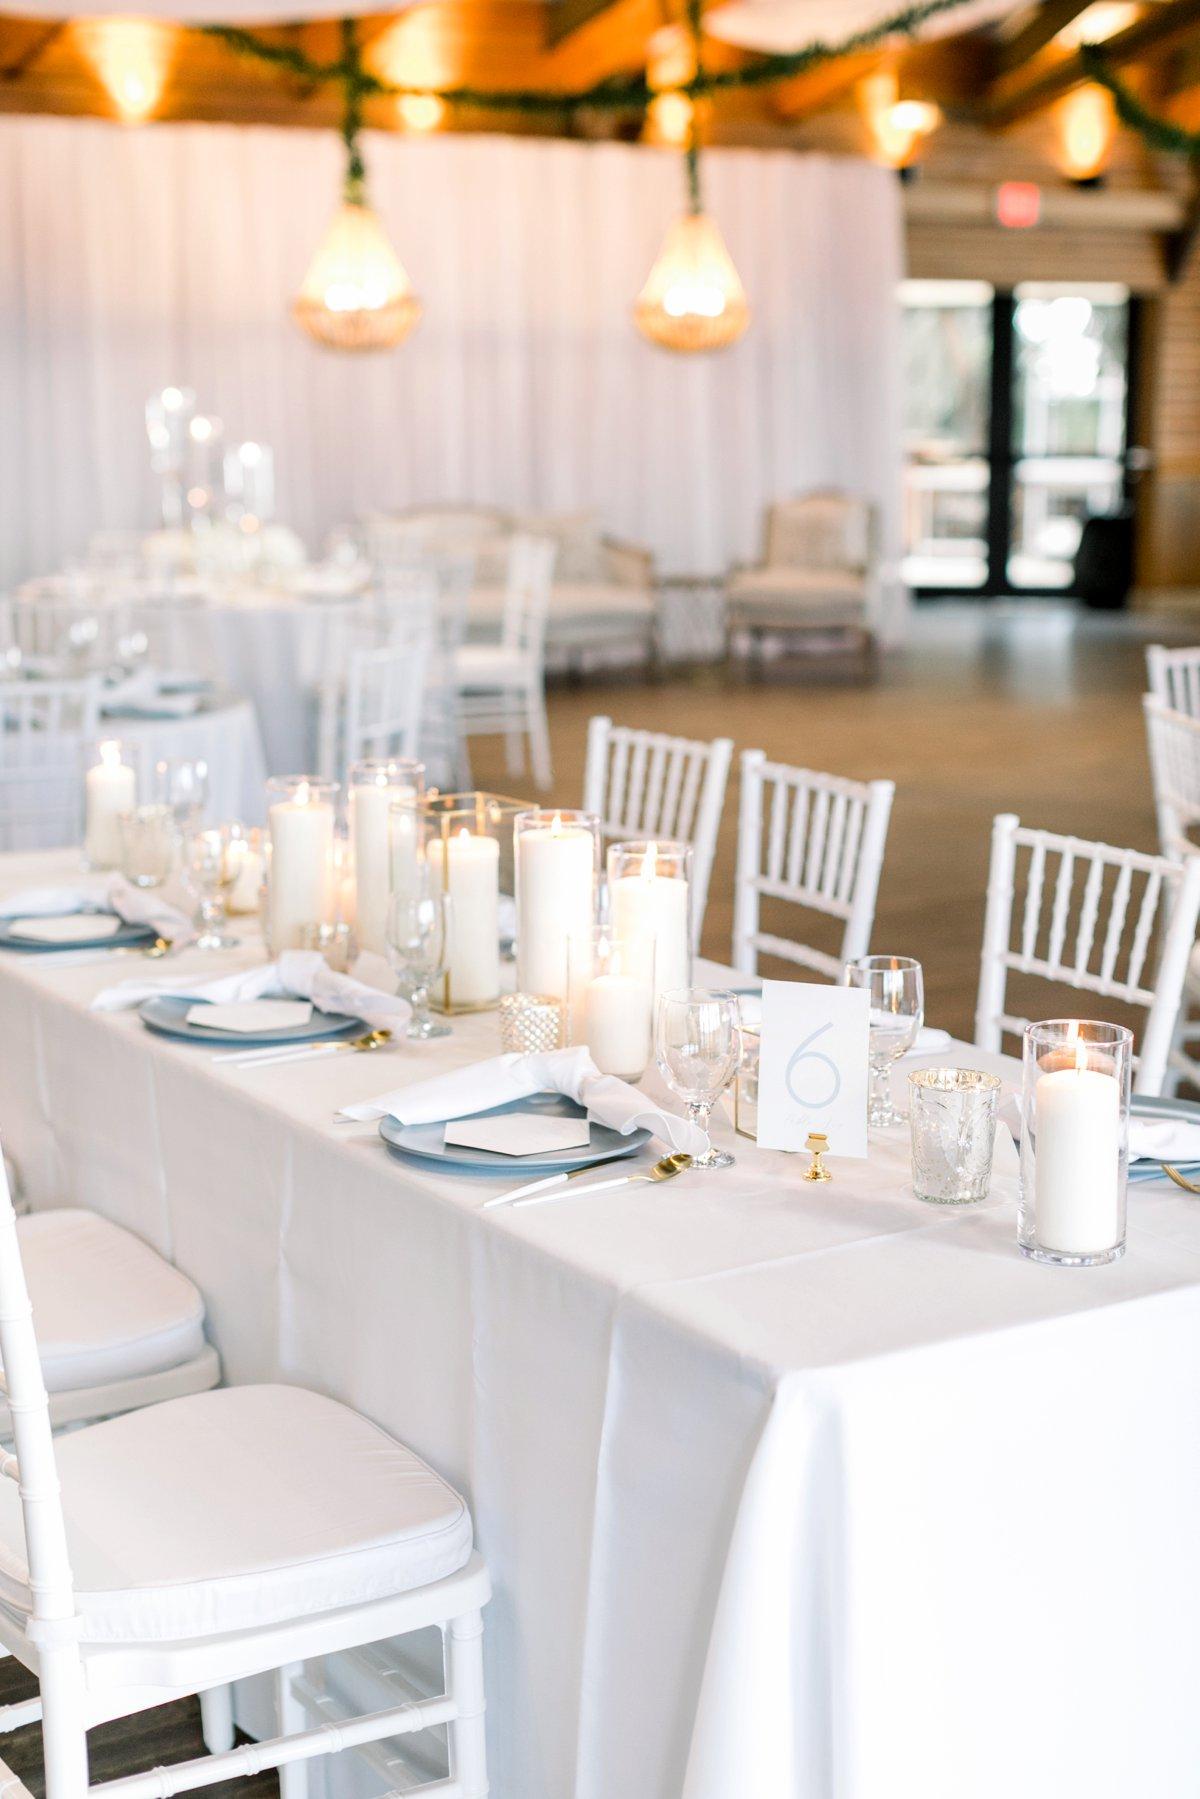 A Chic Coastal Inspired Amelia Island Wedding via TheELD.com